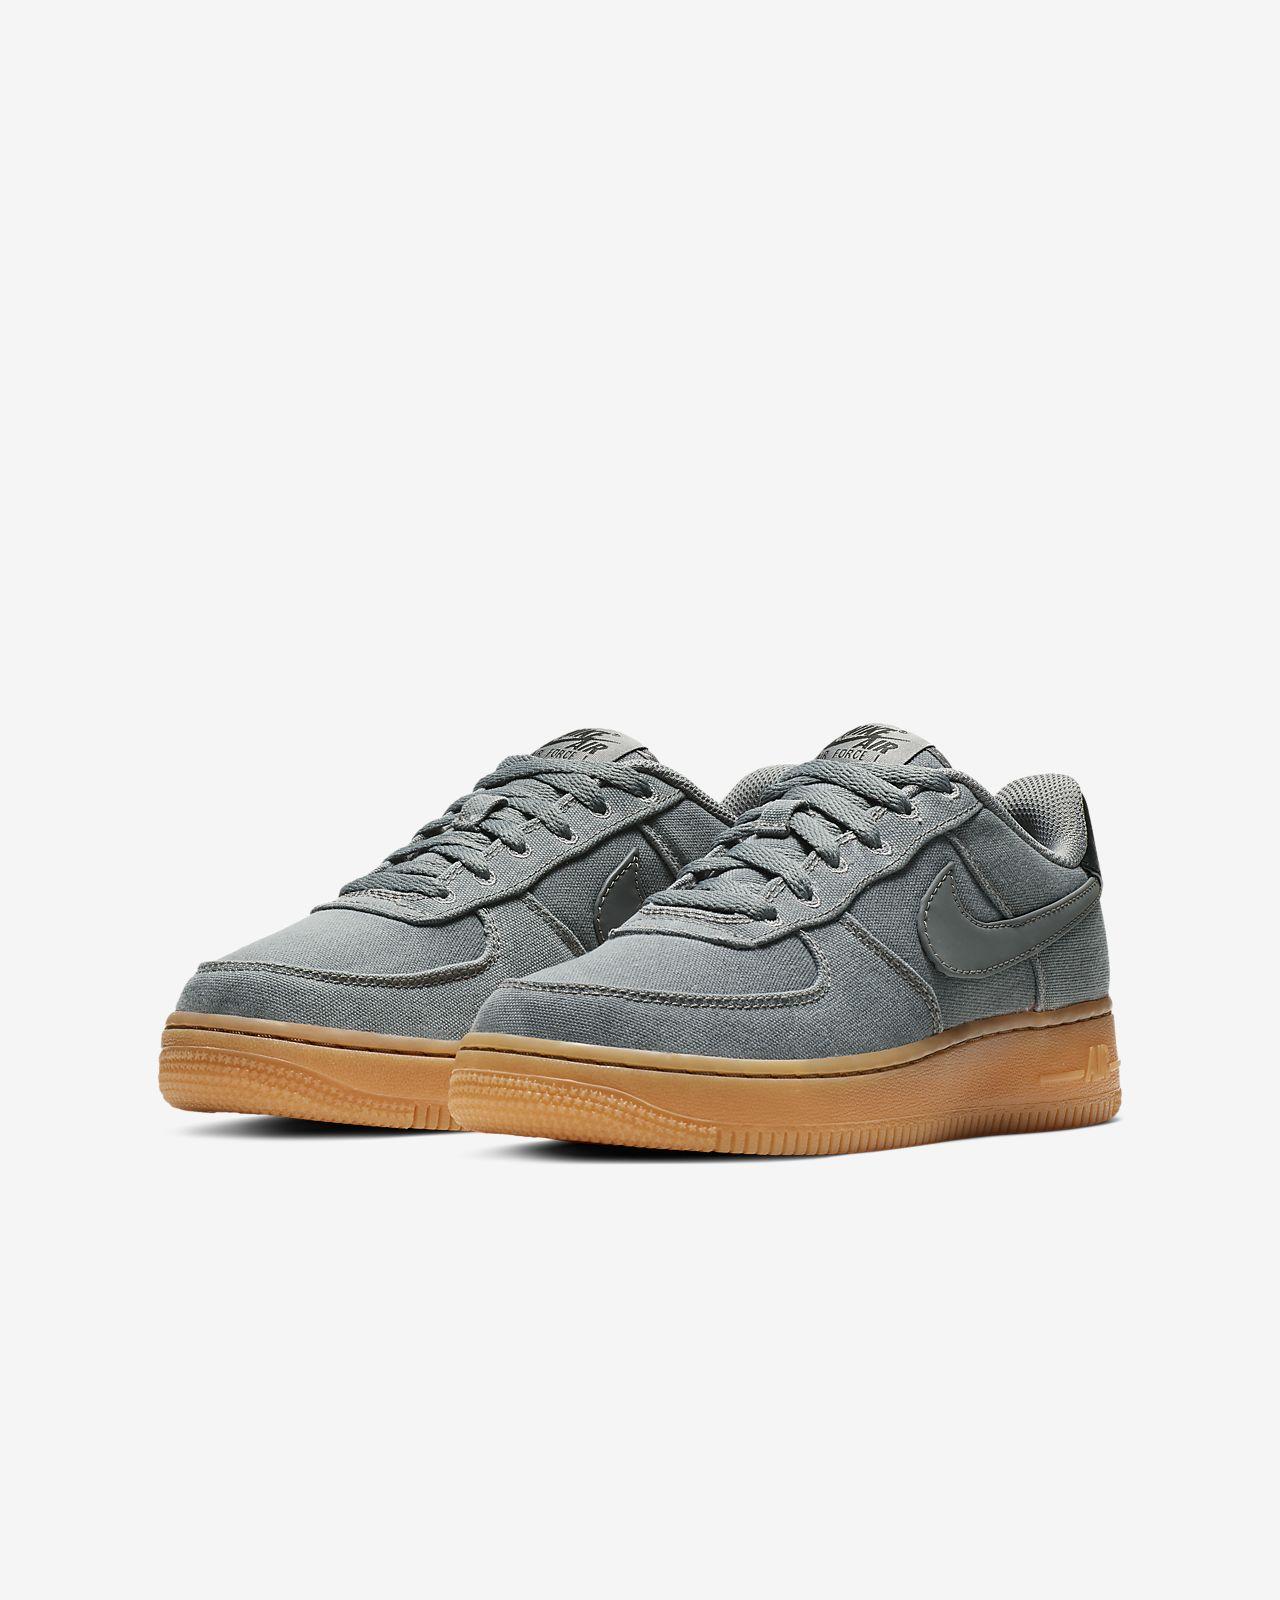 separation shoes e704b 19bc2 Nike Air Force 1 LV8 Style-sko til store børn. Nike.com DK